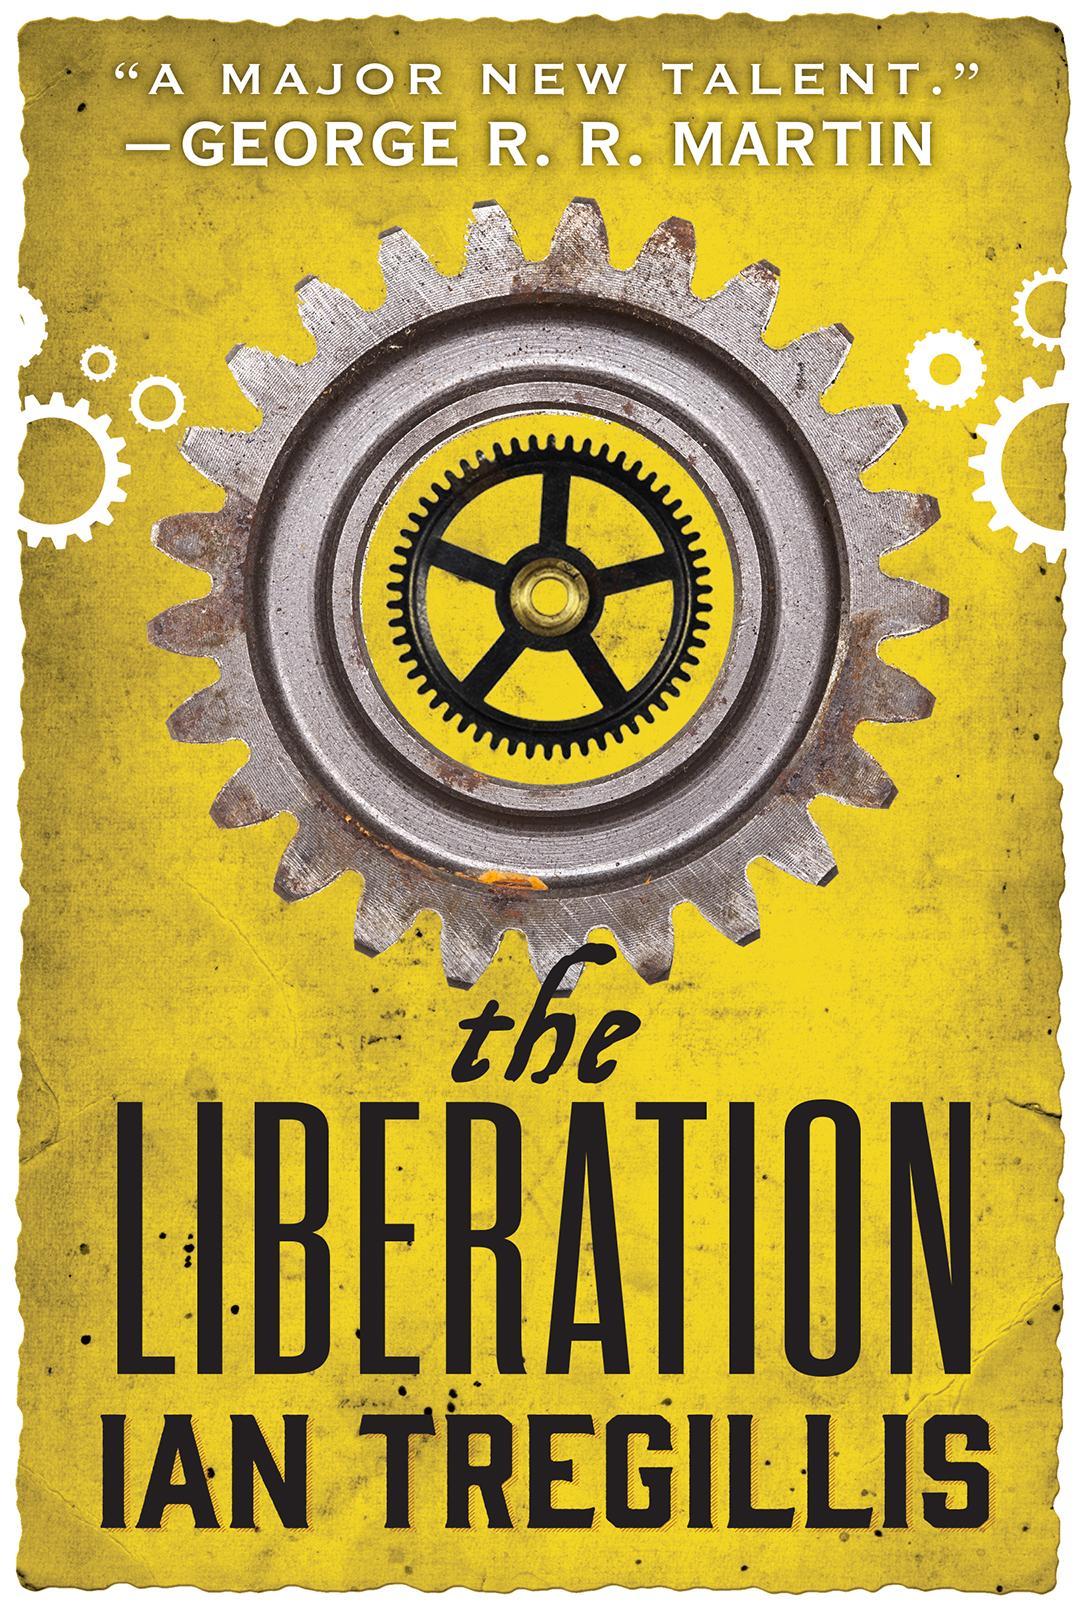 tregillis-aw3-liberation